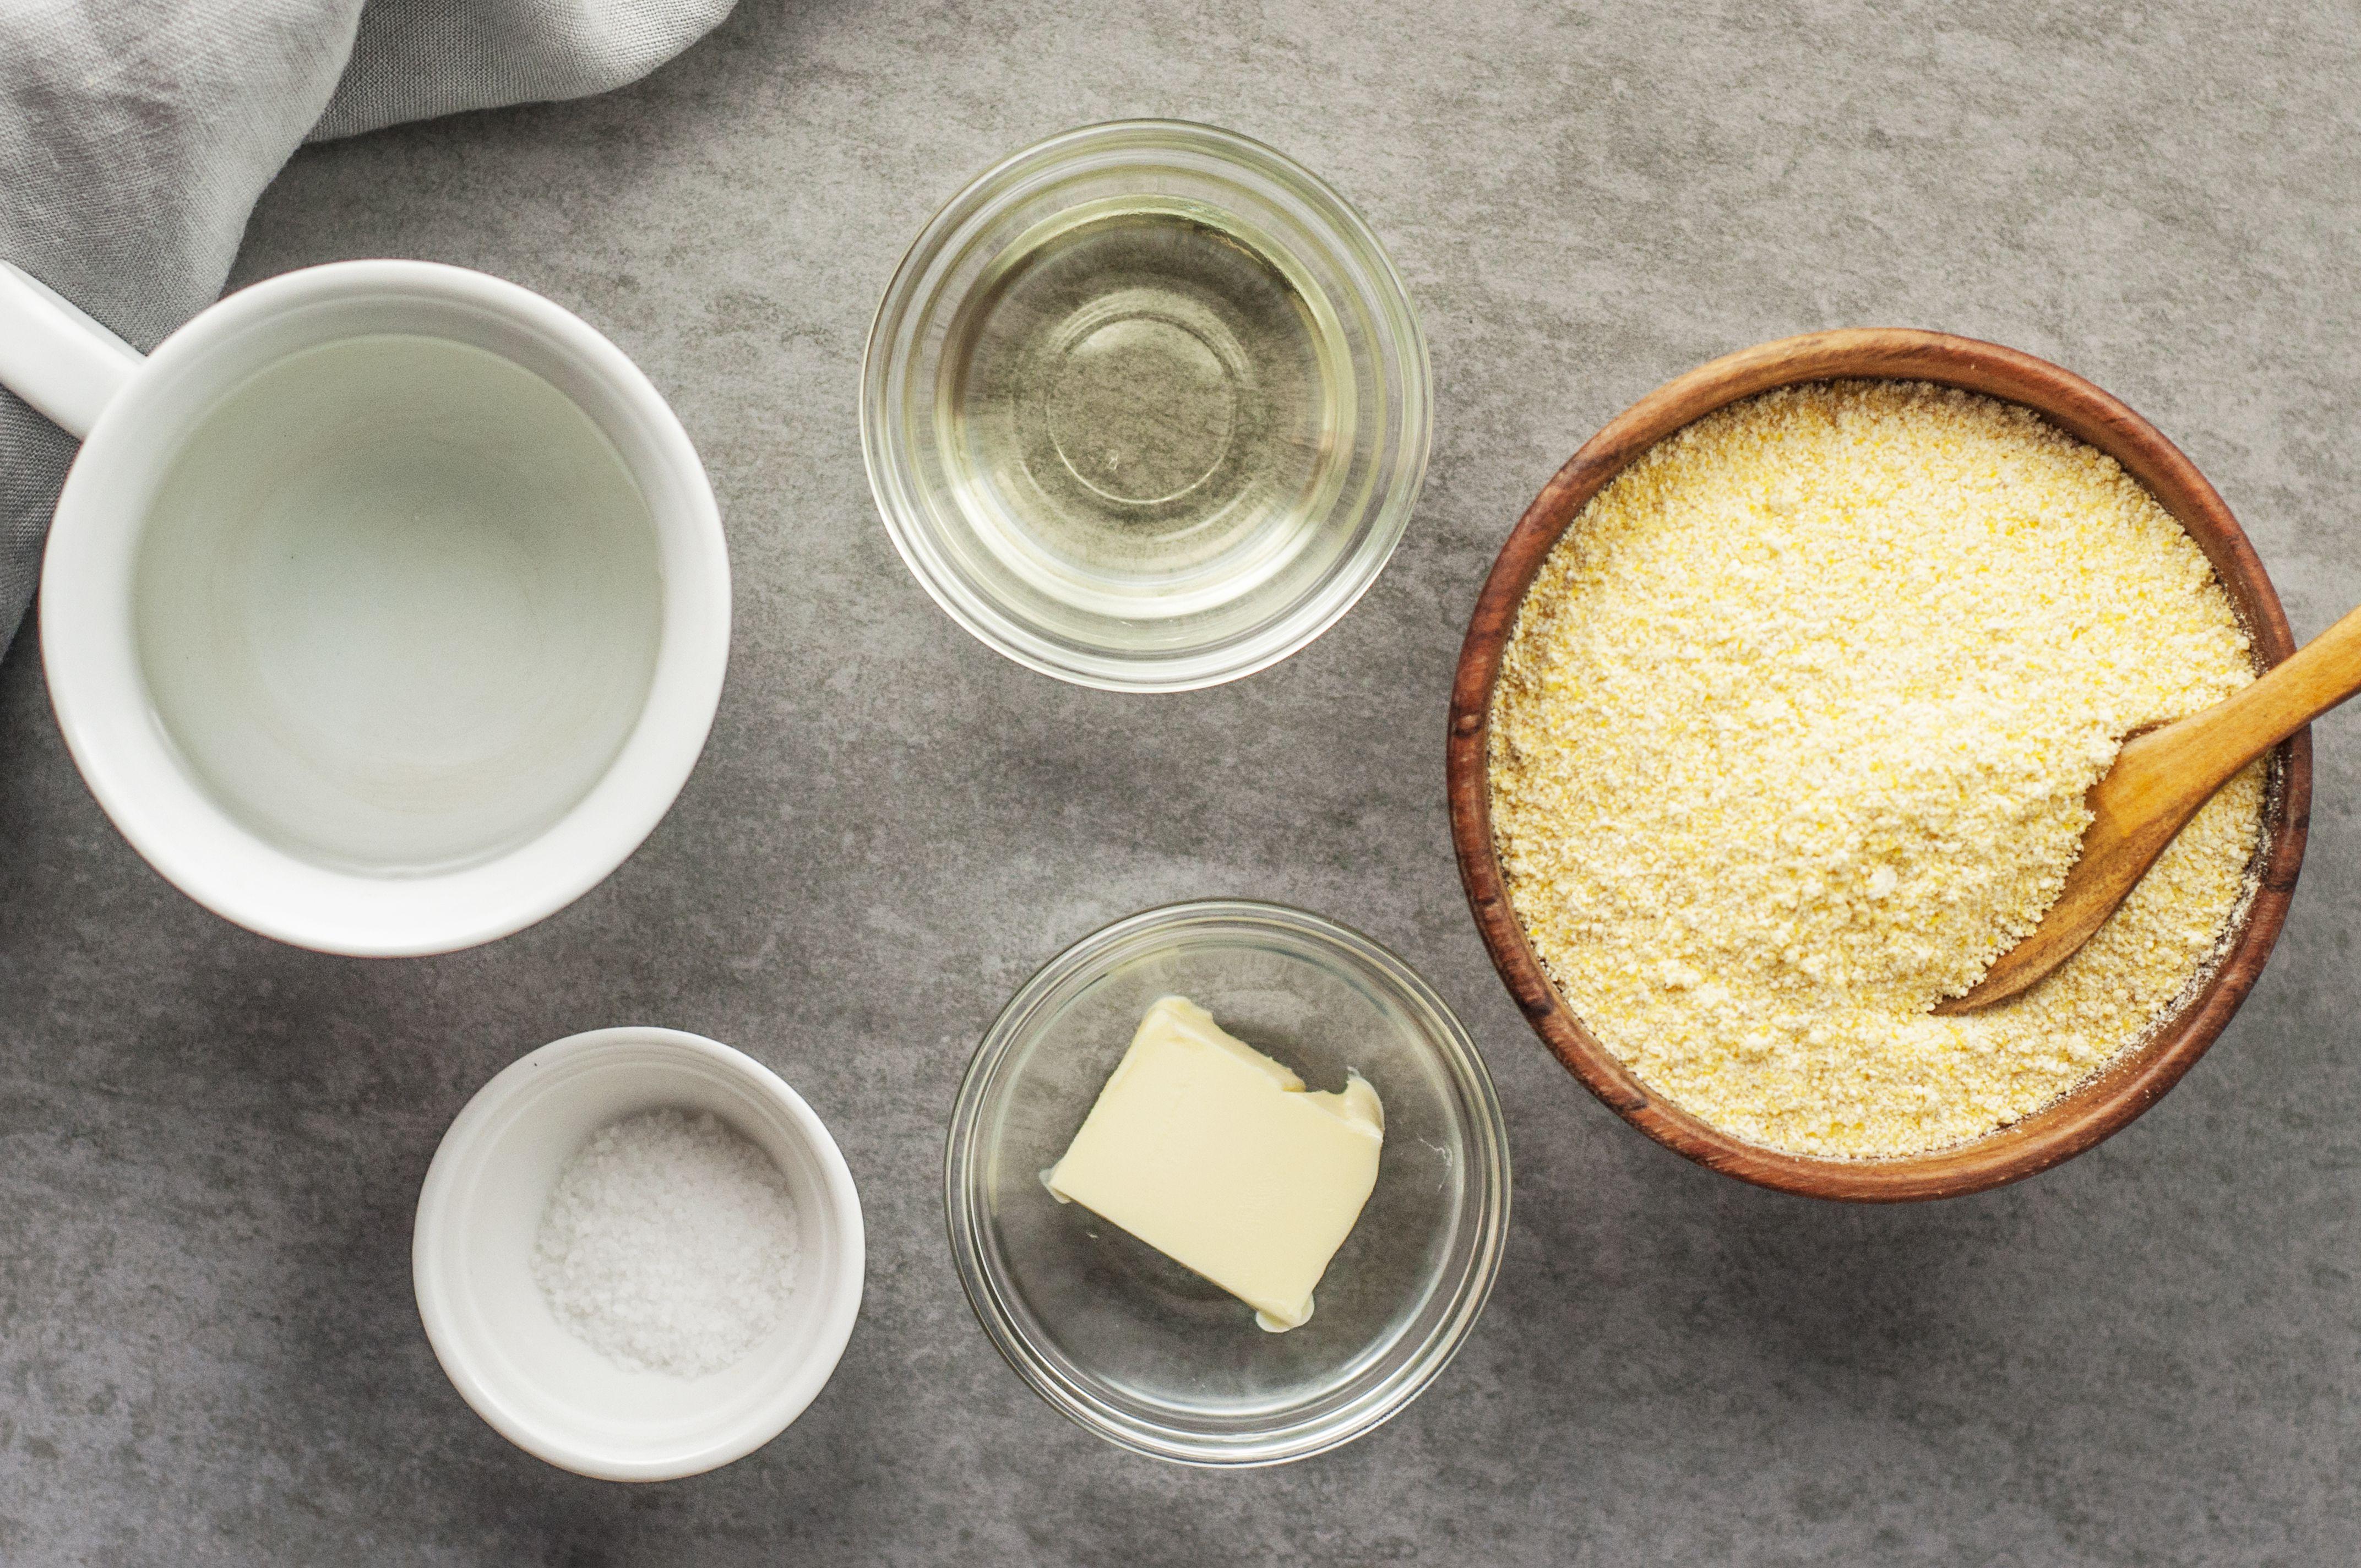 Ingredients for hot water cornbread